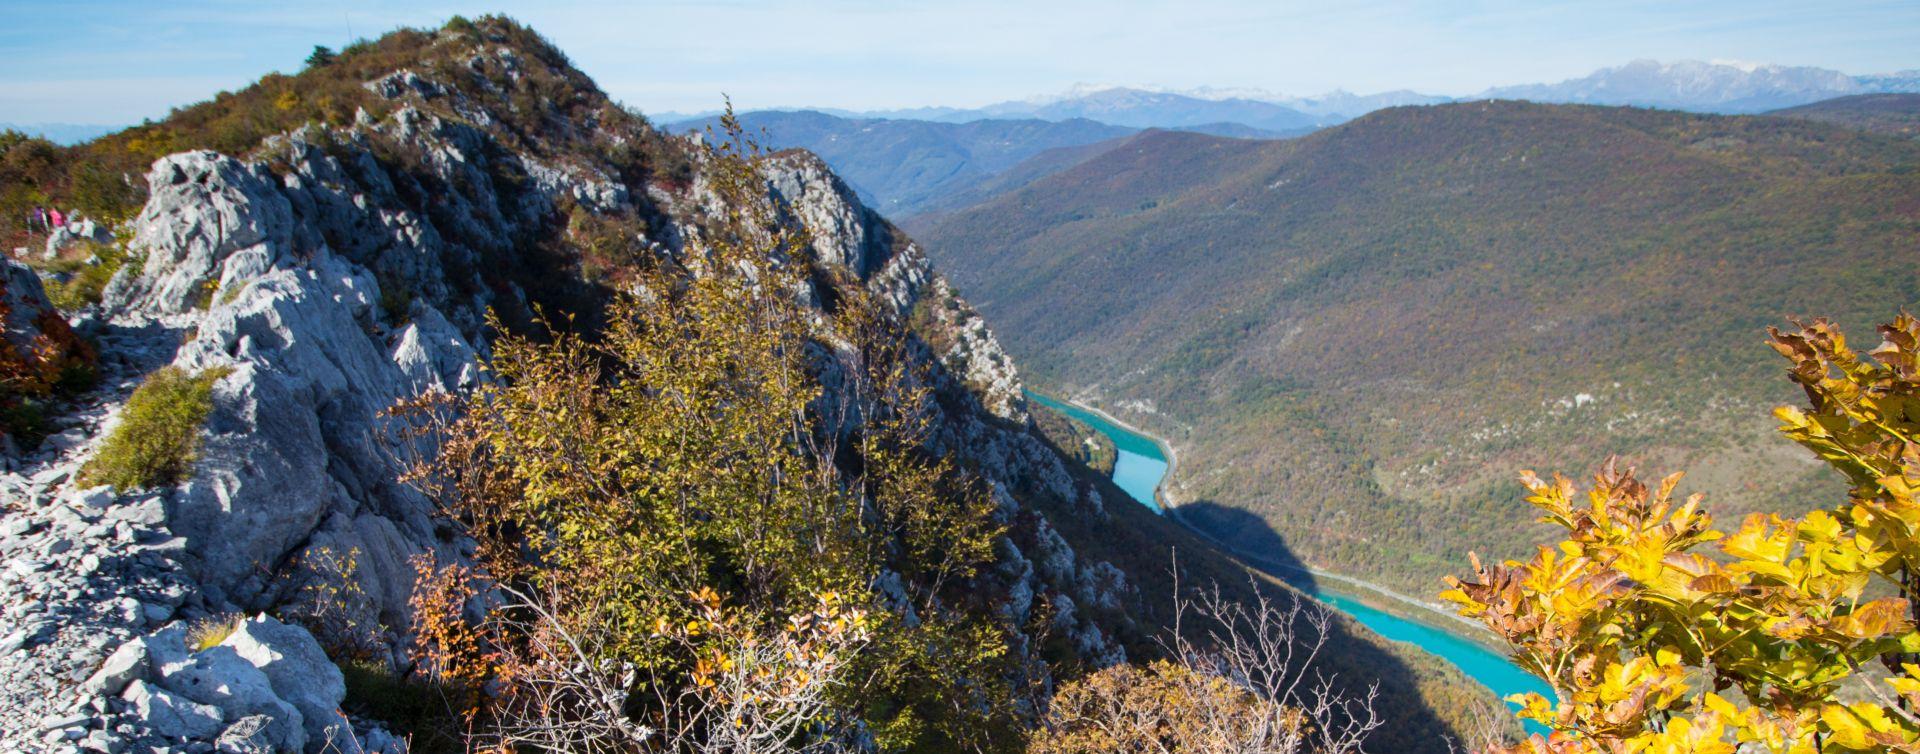 soca river sabotin hill slovenia